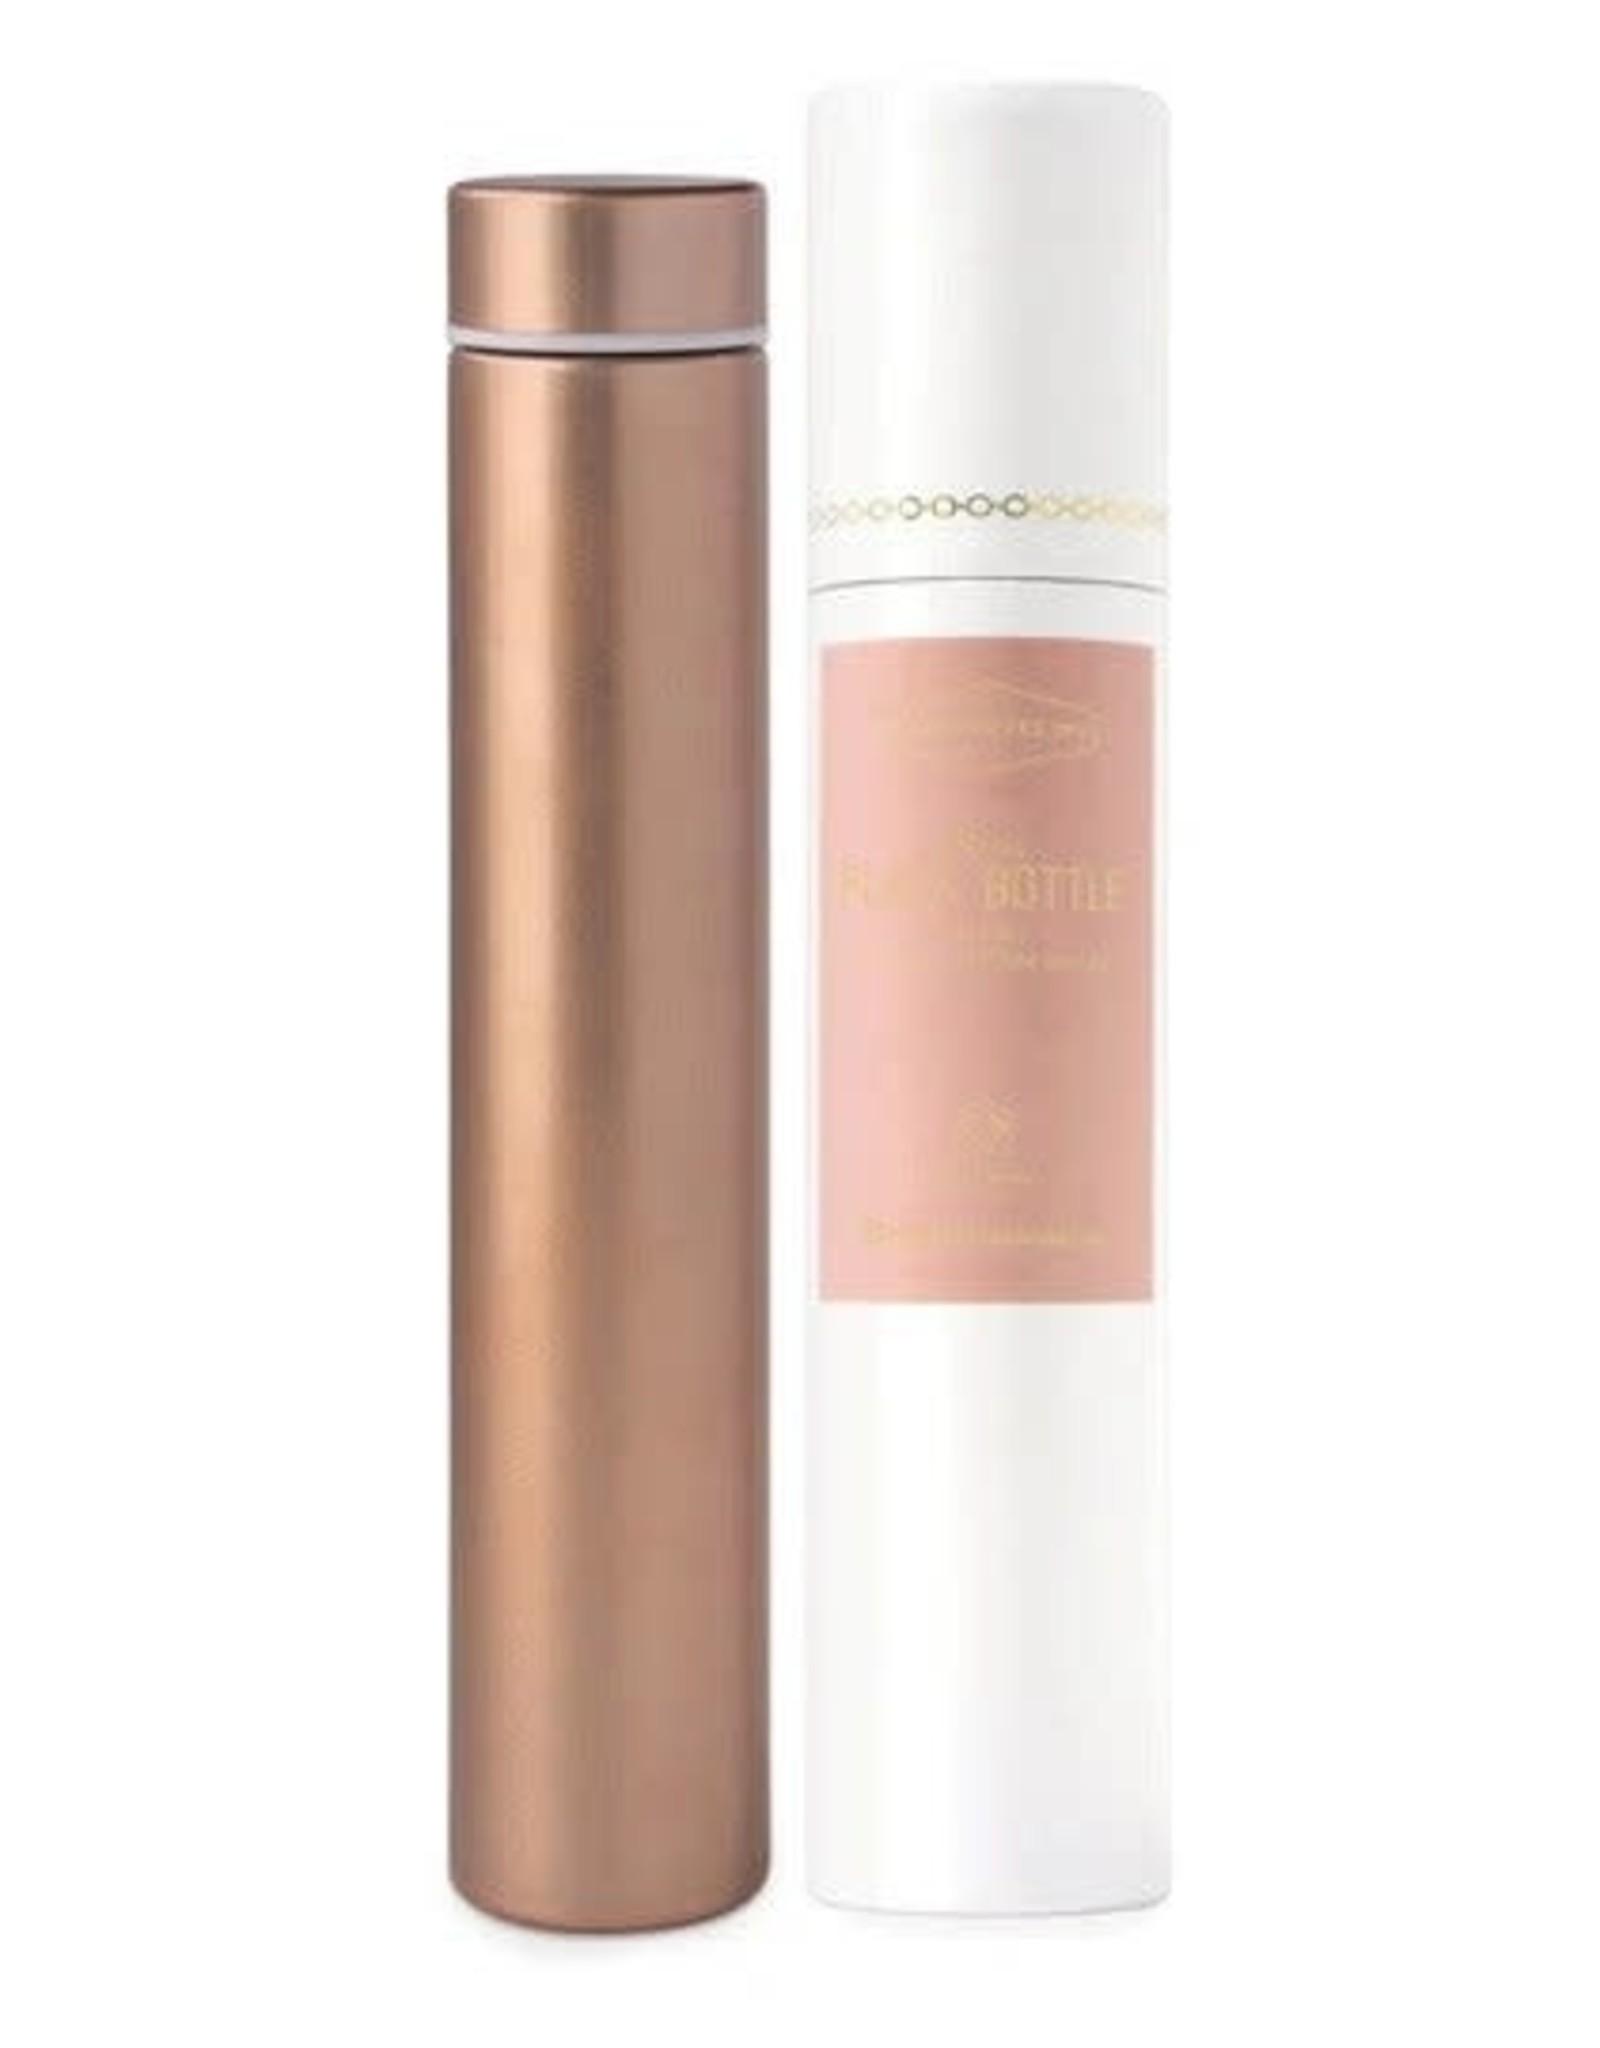 Designworks Ink Slim Flask Bottle in Tube - Copper